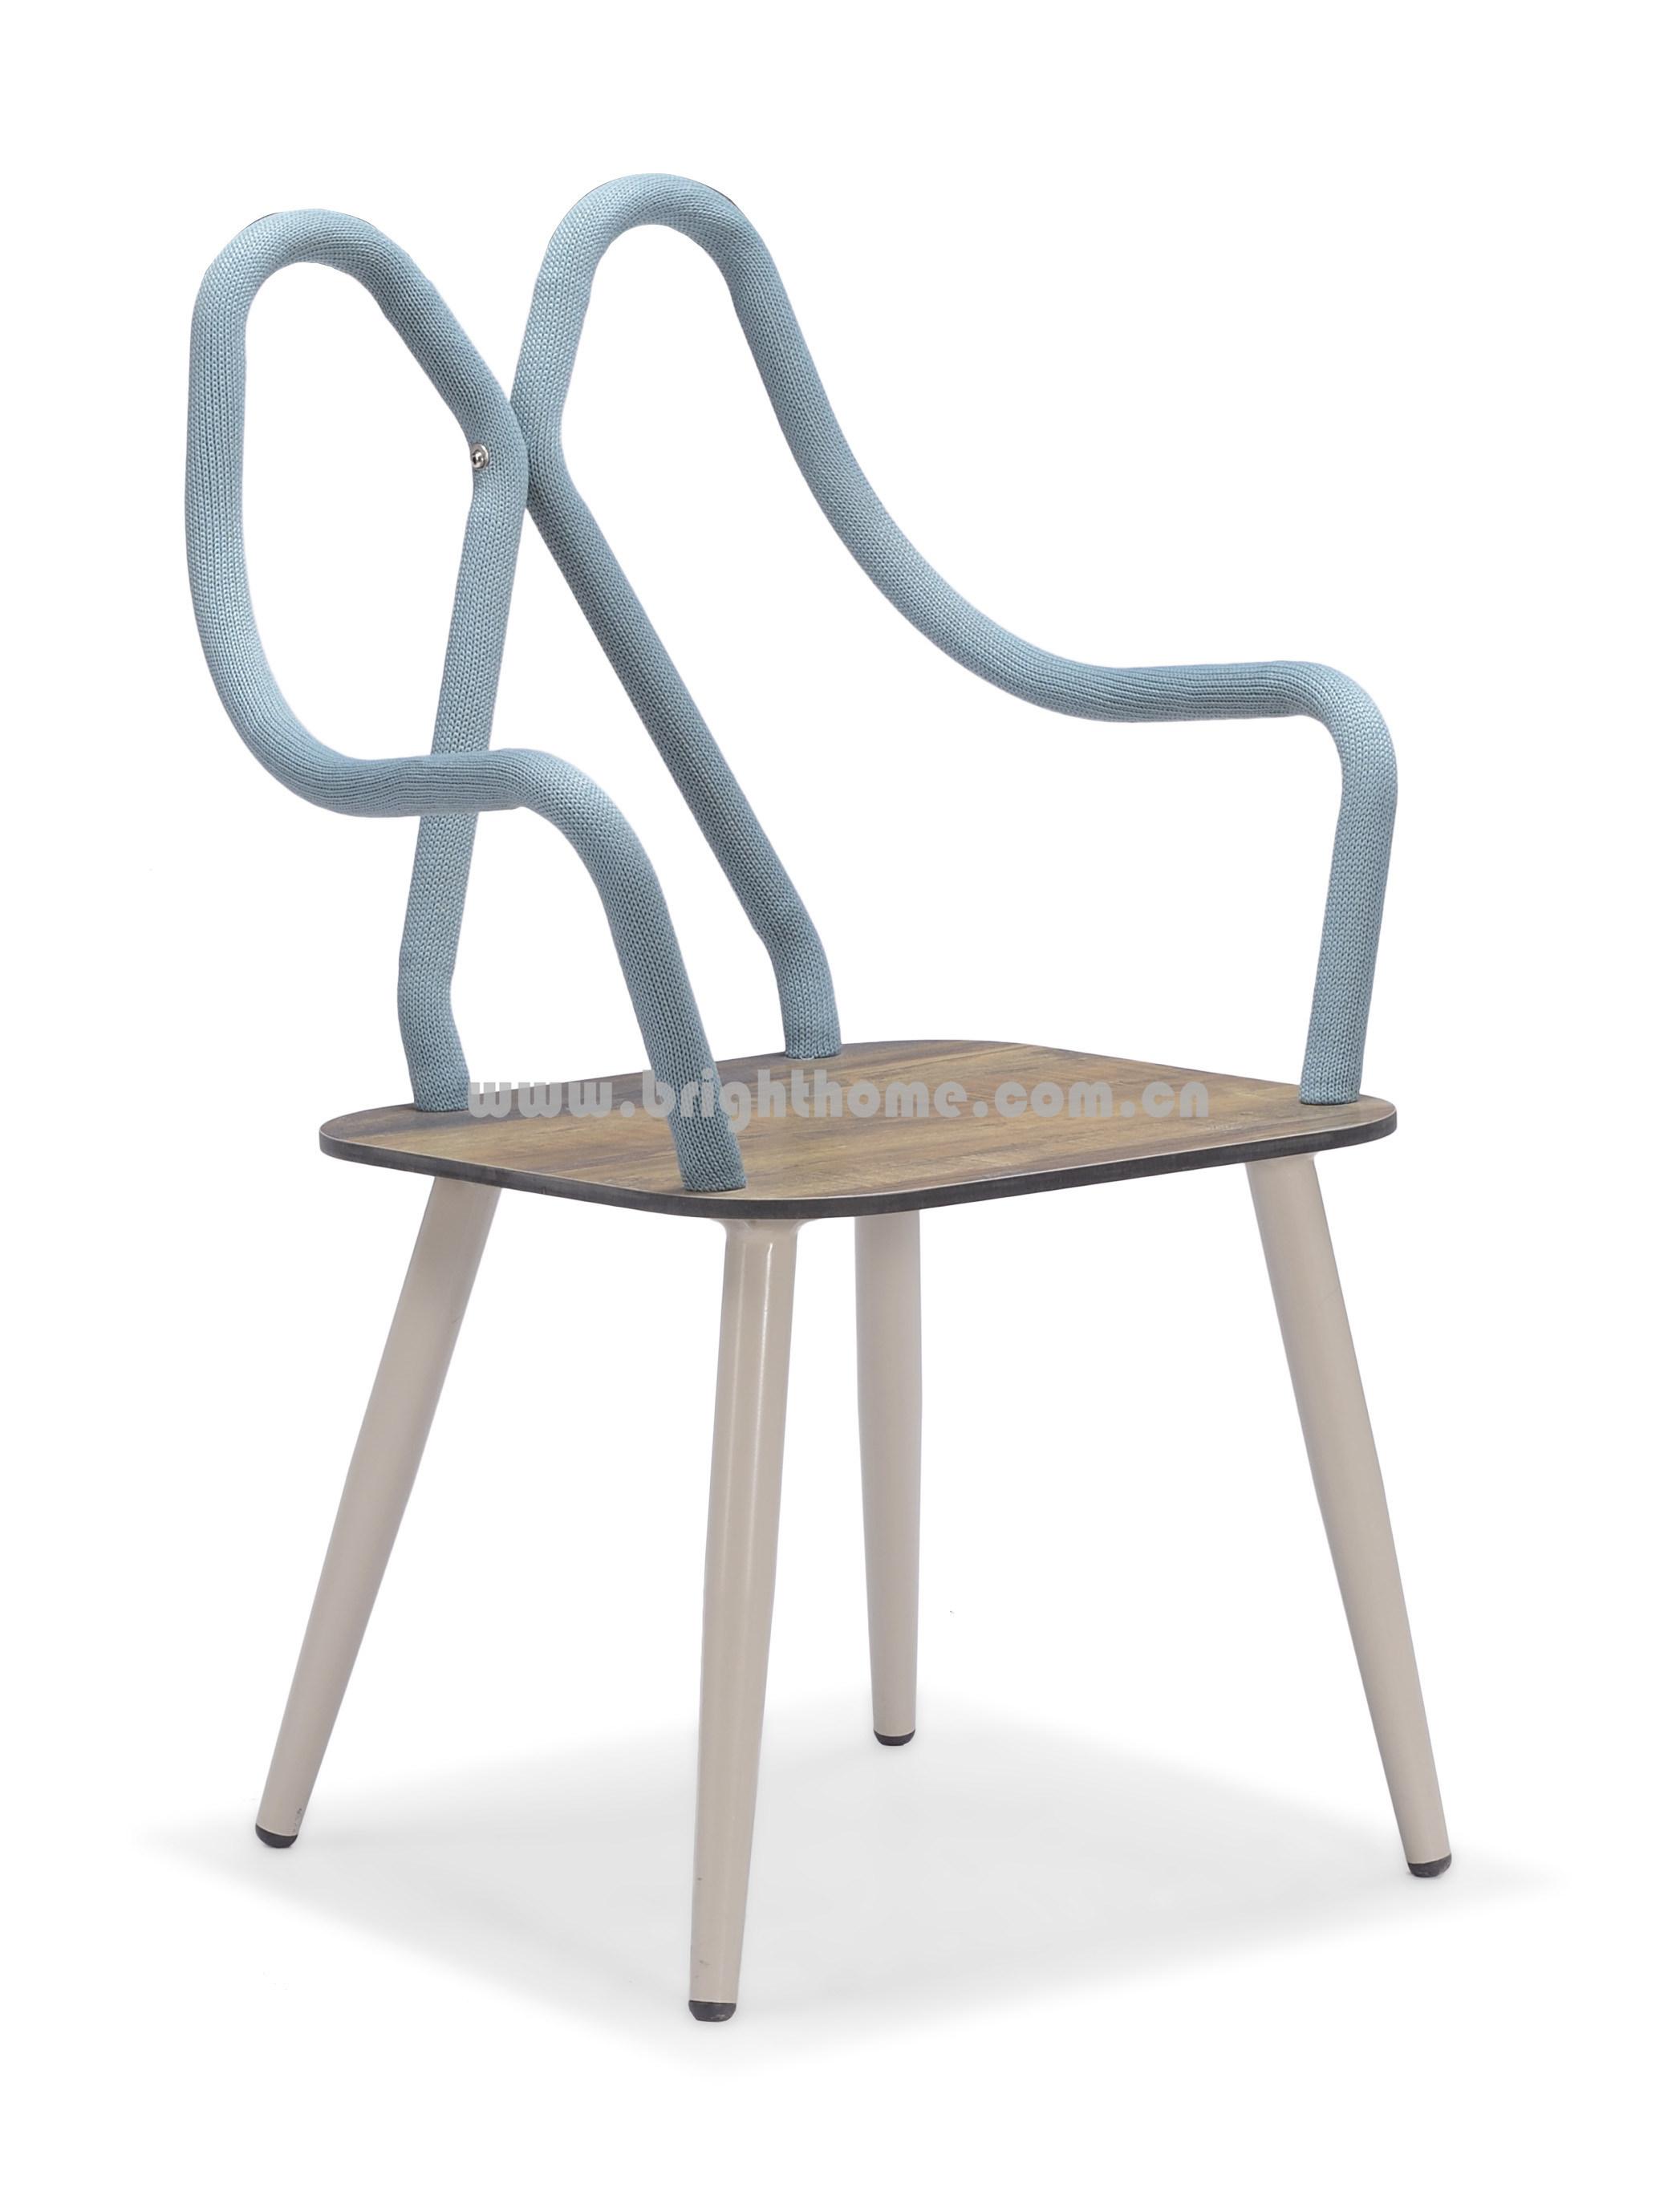 Superb Hot Item Special Design Aluminium Textilene Coffee Garden Furniture Outdoor Chair Inzonedesignstudio Interior Chair Design Inzonedesignstudiocom